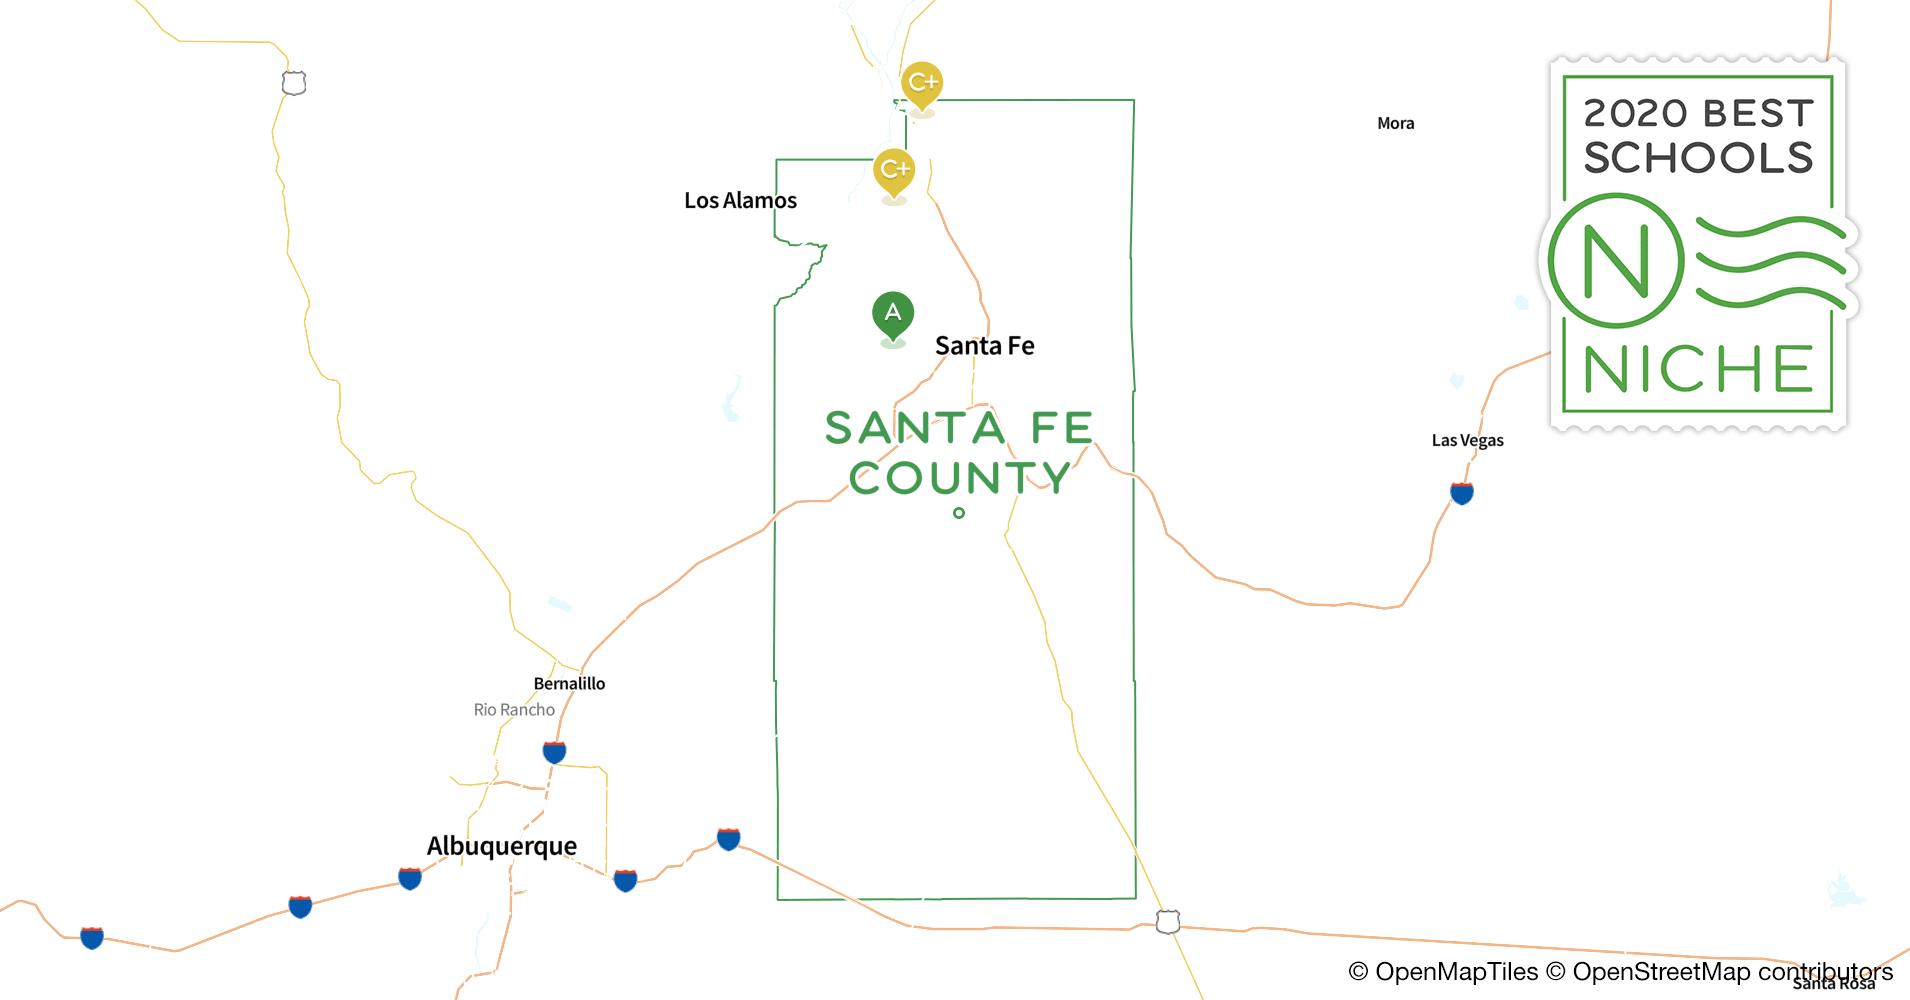 2020 Best Public Elementary Schools in Santa Fe County, NM